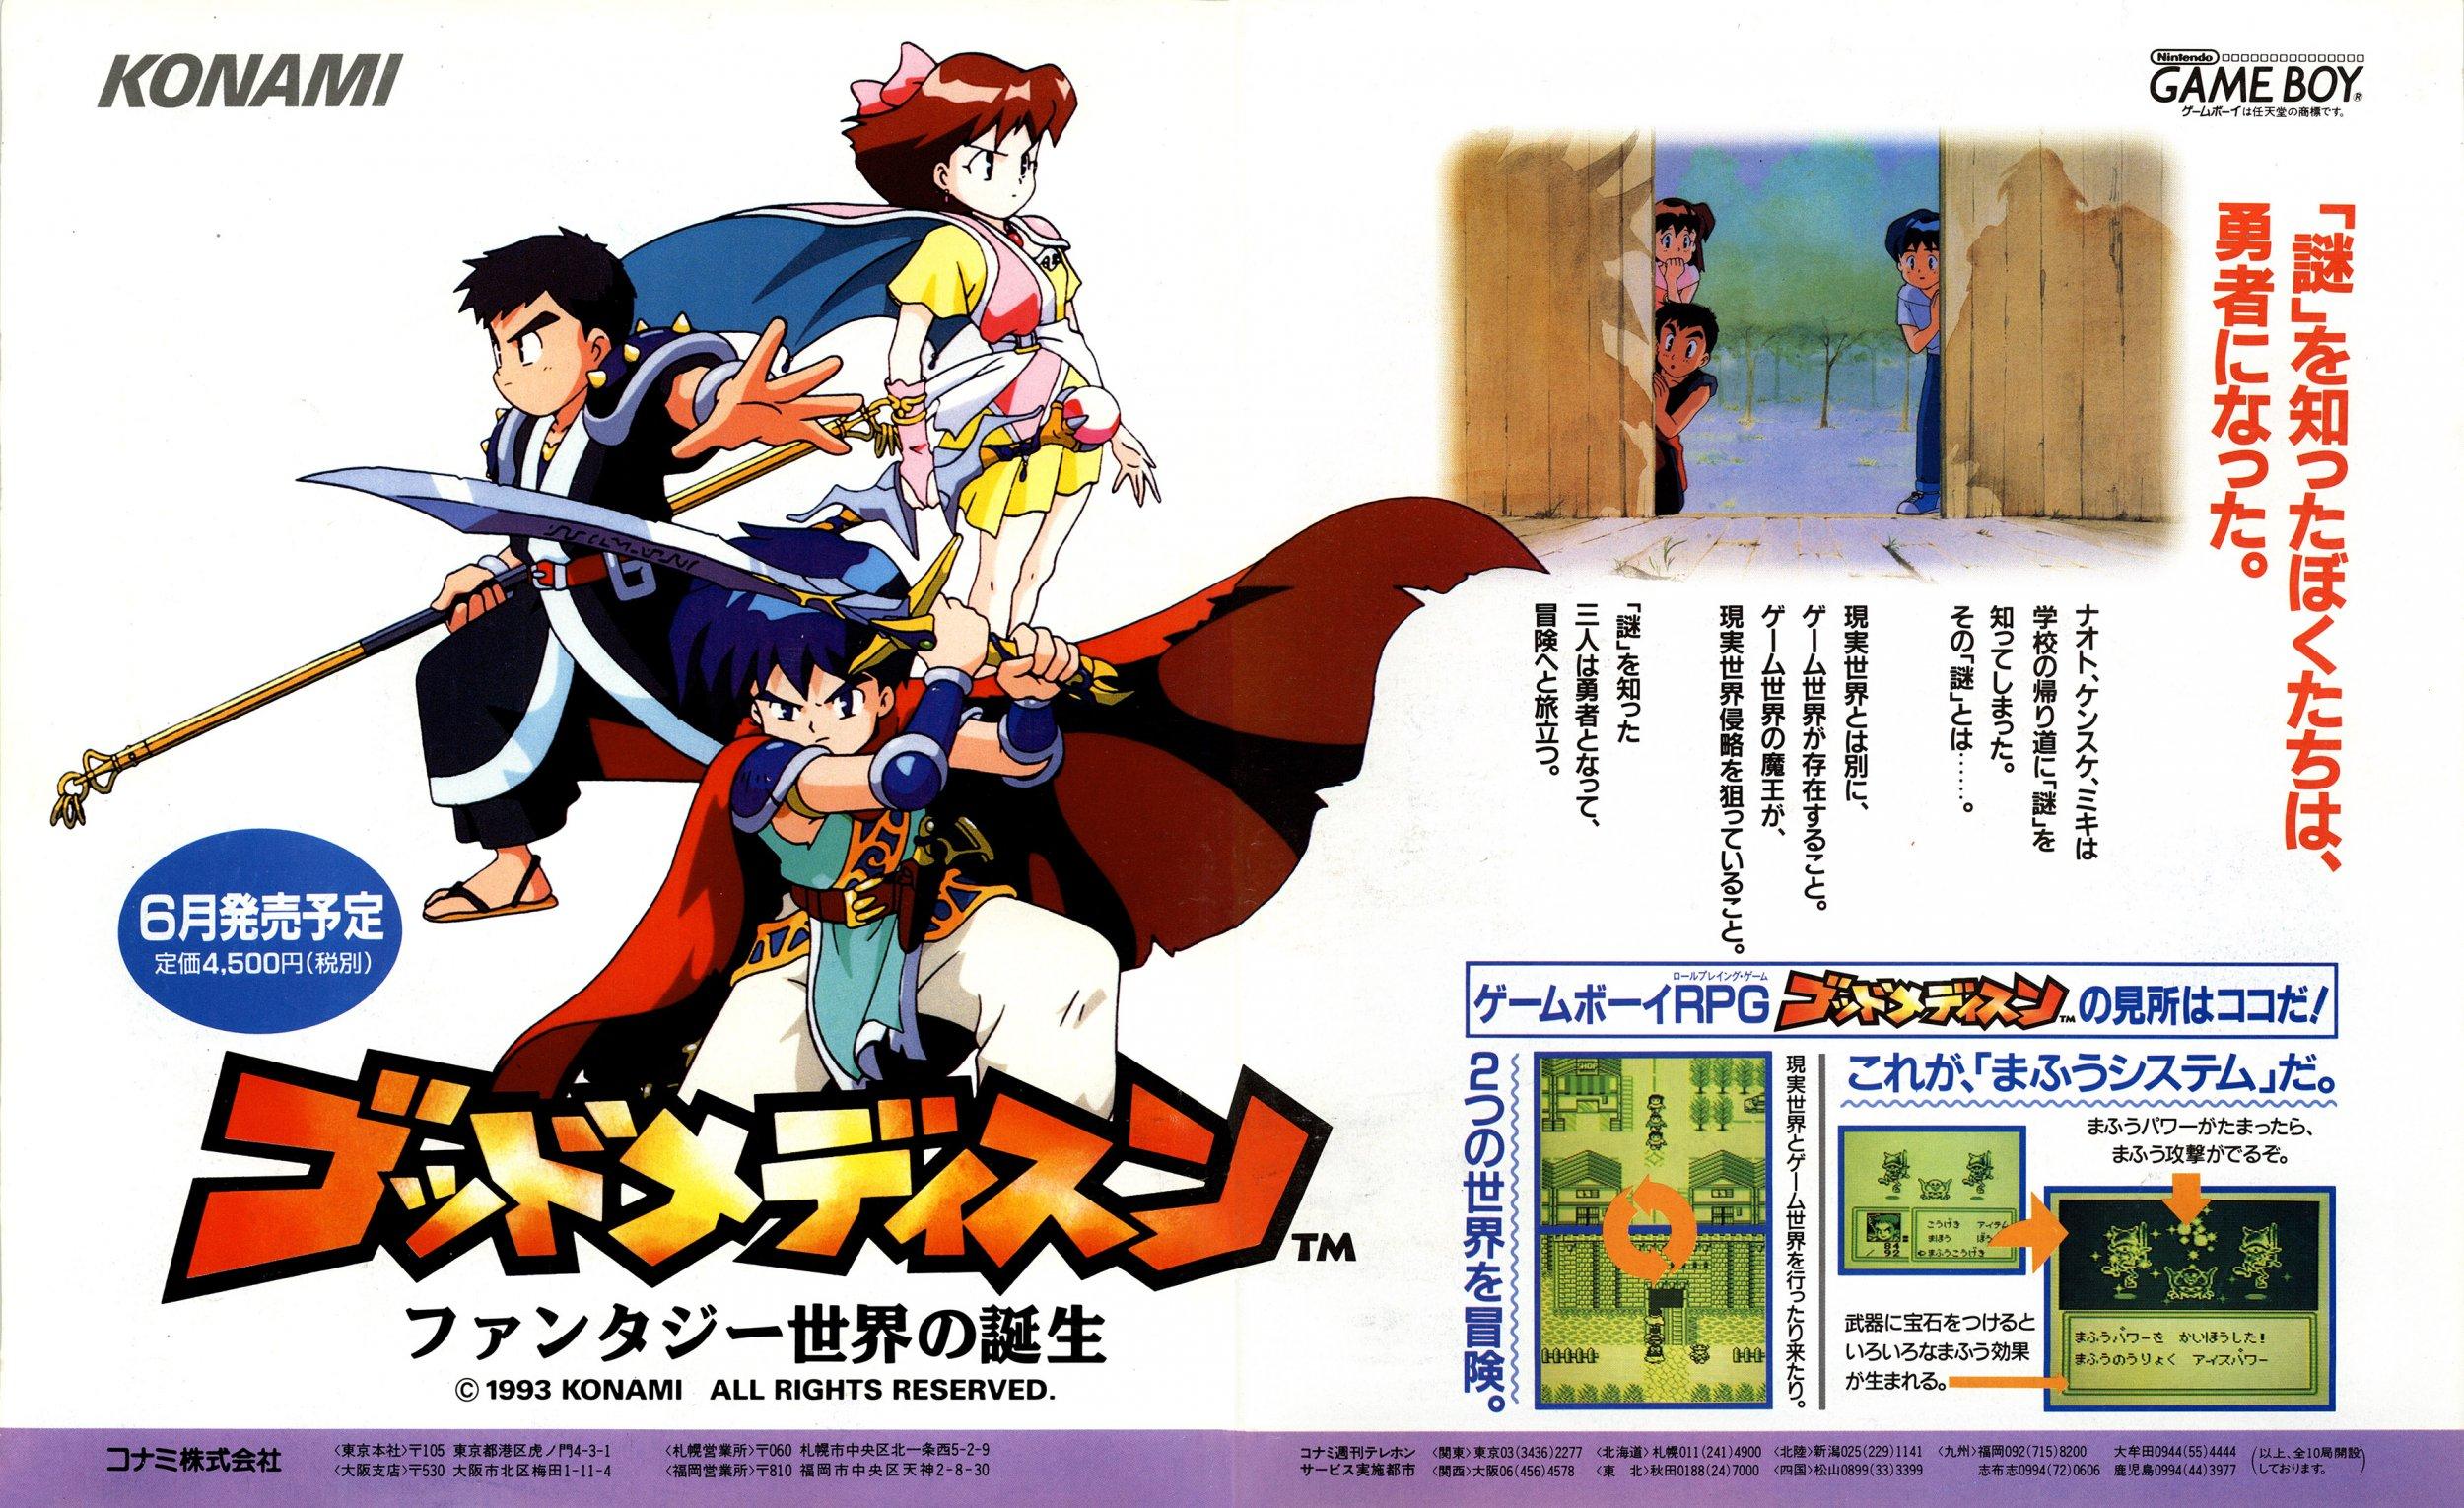 God Medicine: Fantasy Sekai no Tanjou (Japan)